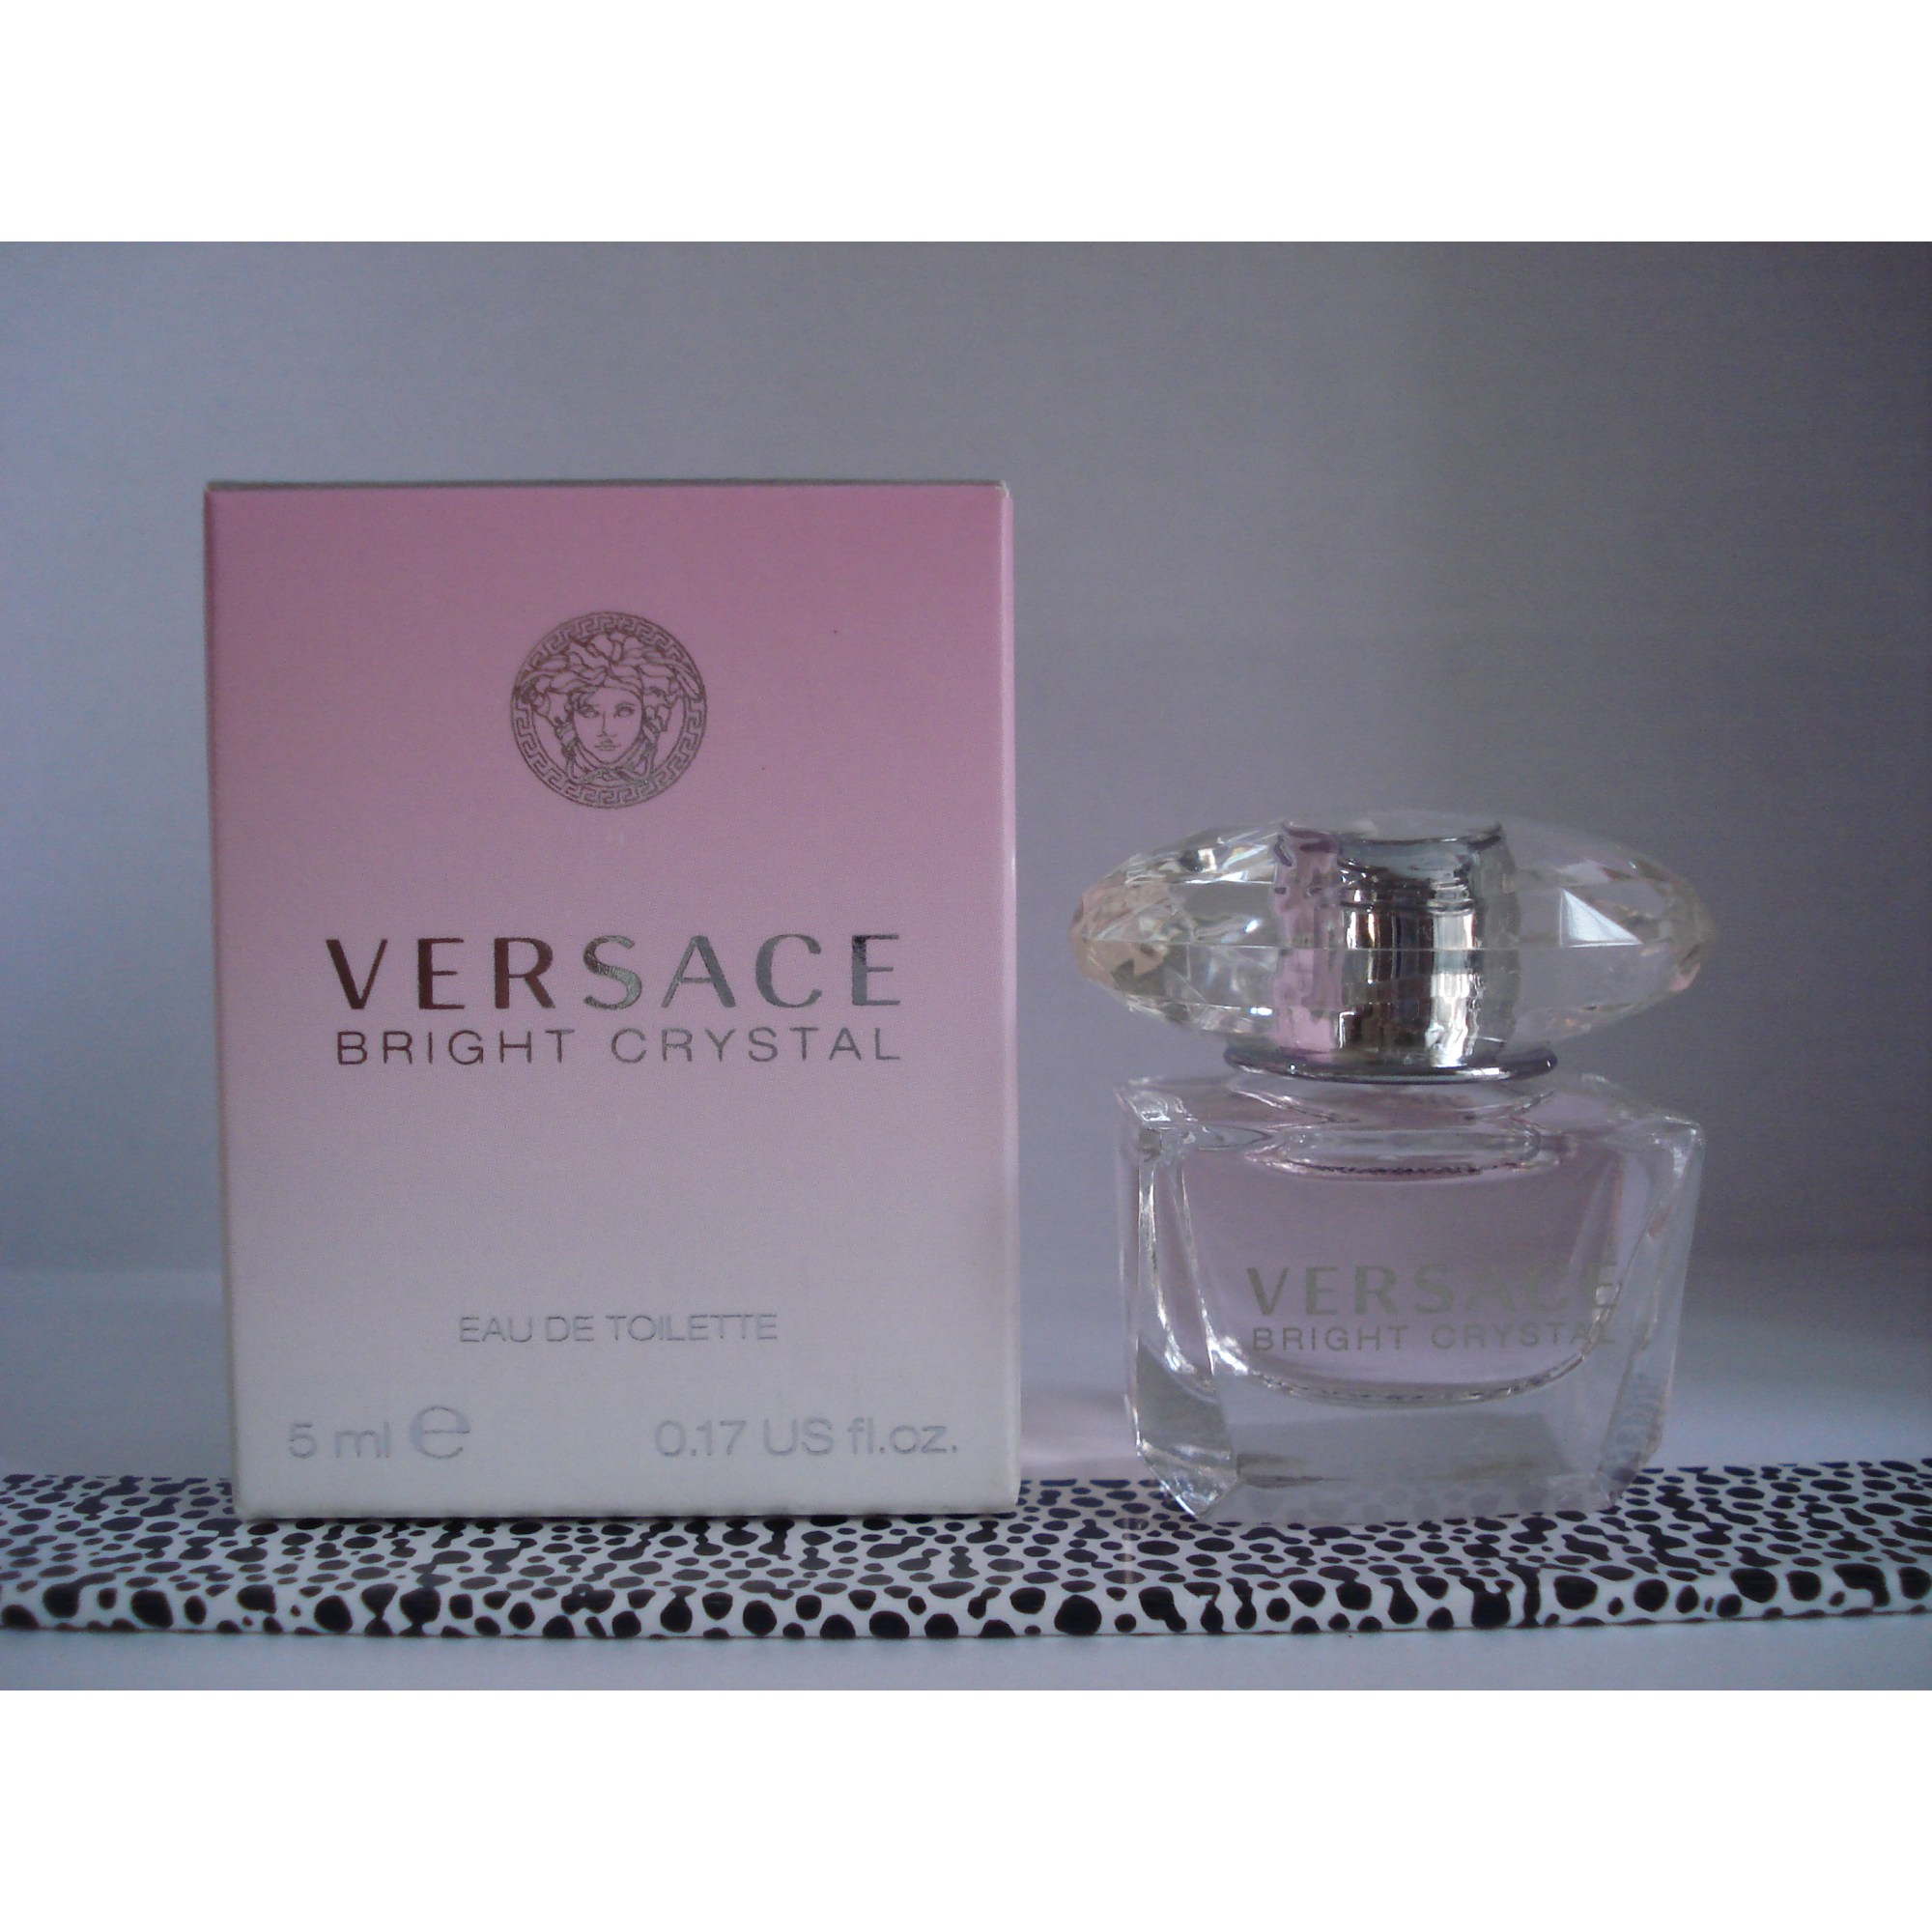 Miniature Parfum Parfum Miniature Parfum Miniature Parfum Parfum Miniature Miniature Parfum Miniature Parfum Miniature Miniature v0nwm8NO